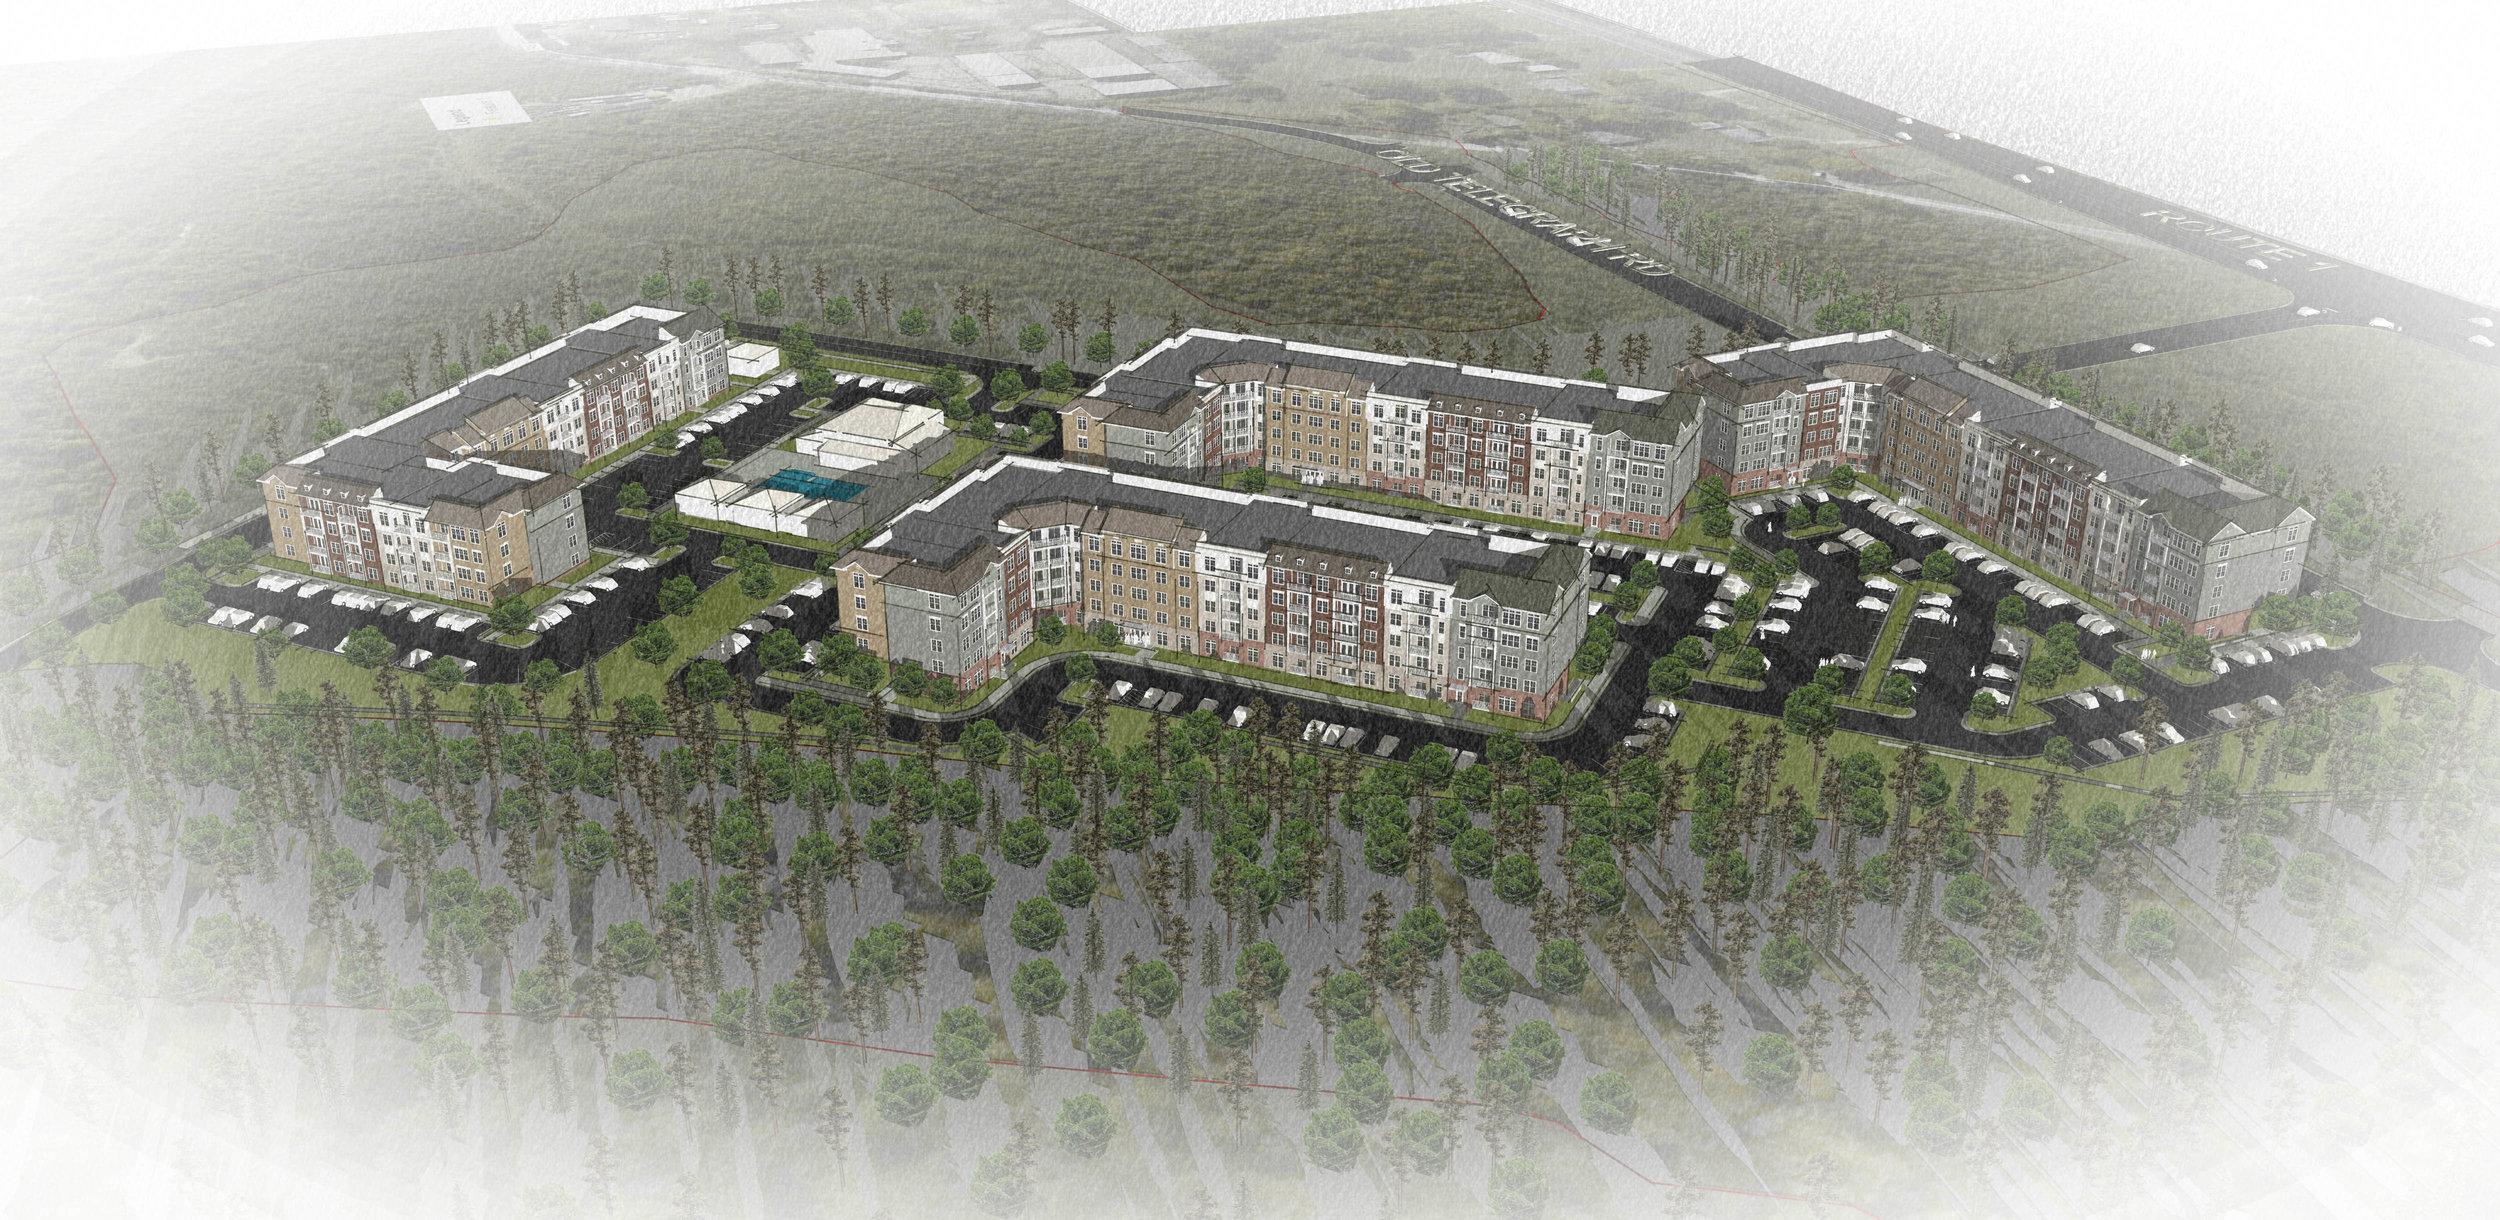 Senior Housing -  Proposed Senior Housing in Spotsylvania County